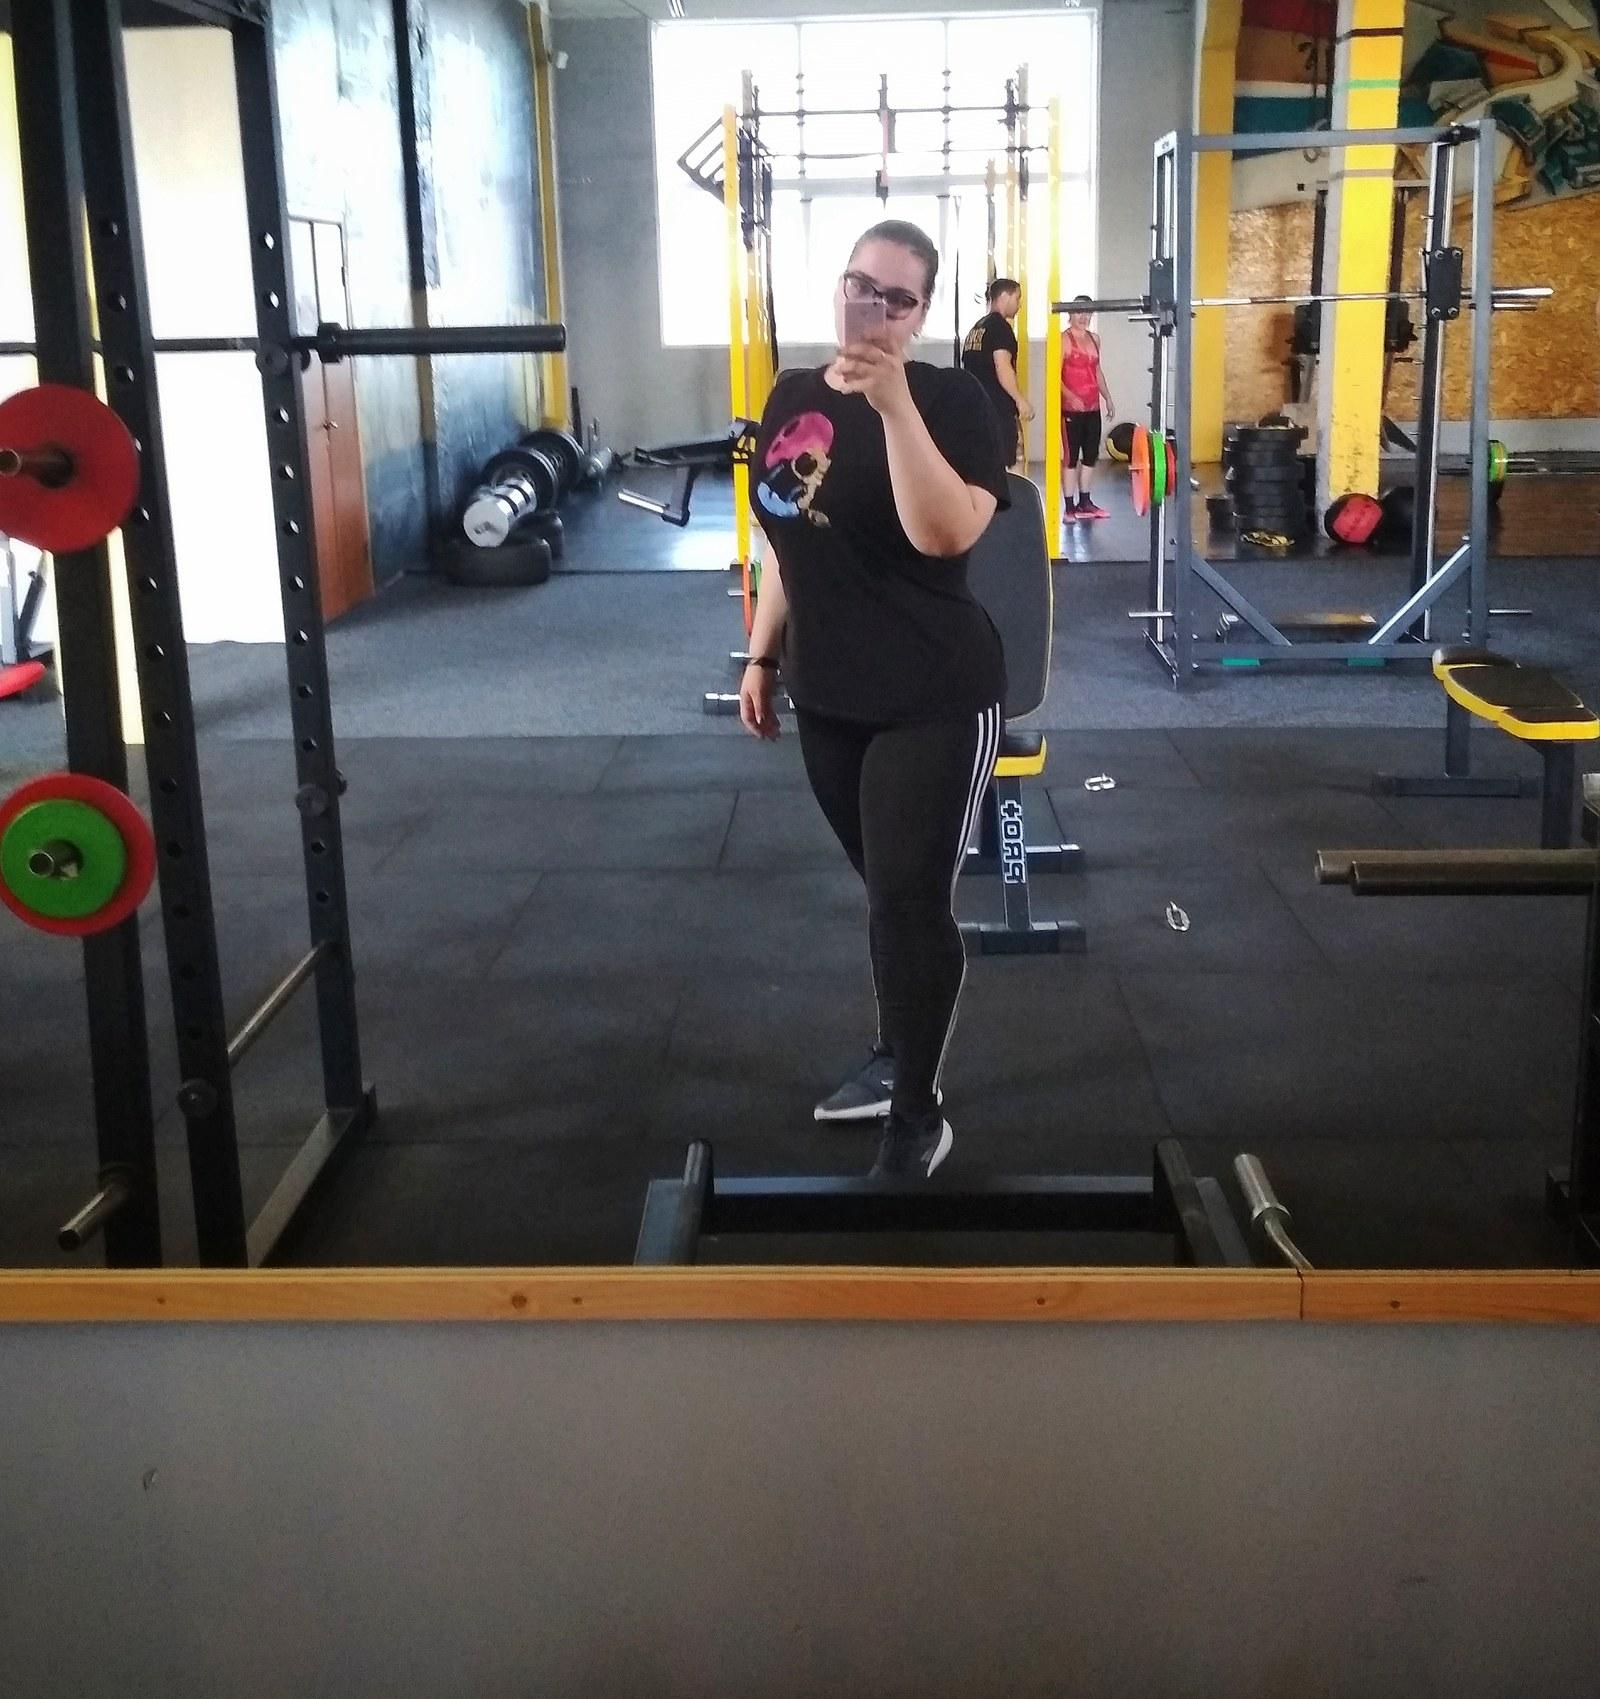 Минус 38 килограмм за один год. Моя история